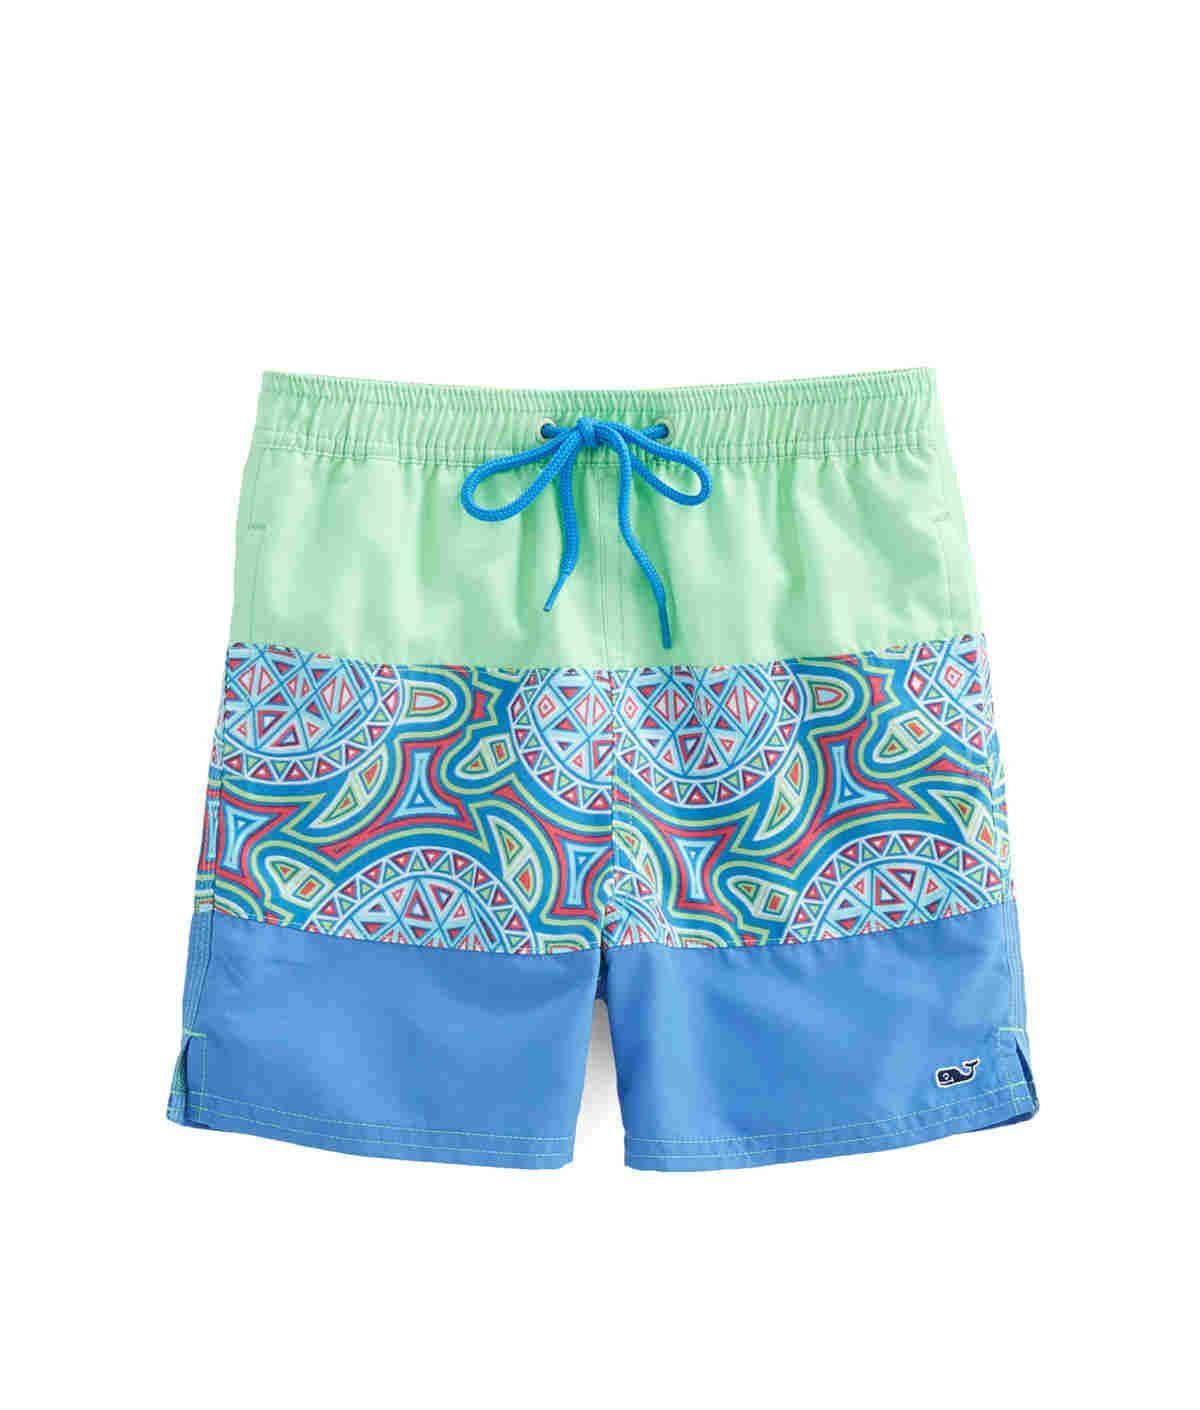 8cc9ae6607650 Vineyard Vines Boys Sea Of Turtles Pieced Bungalow Shorts